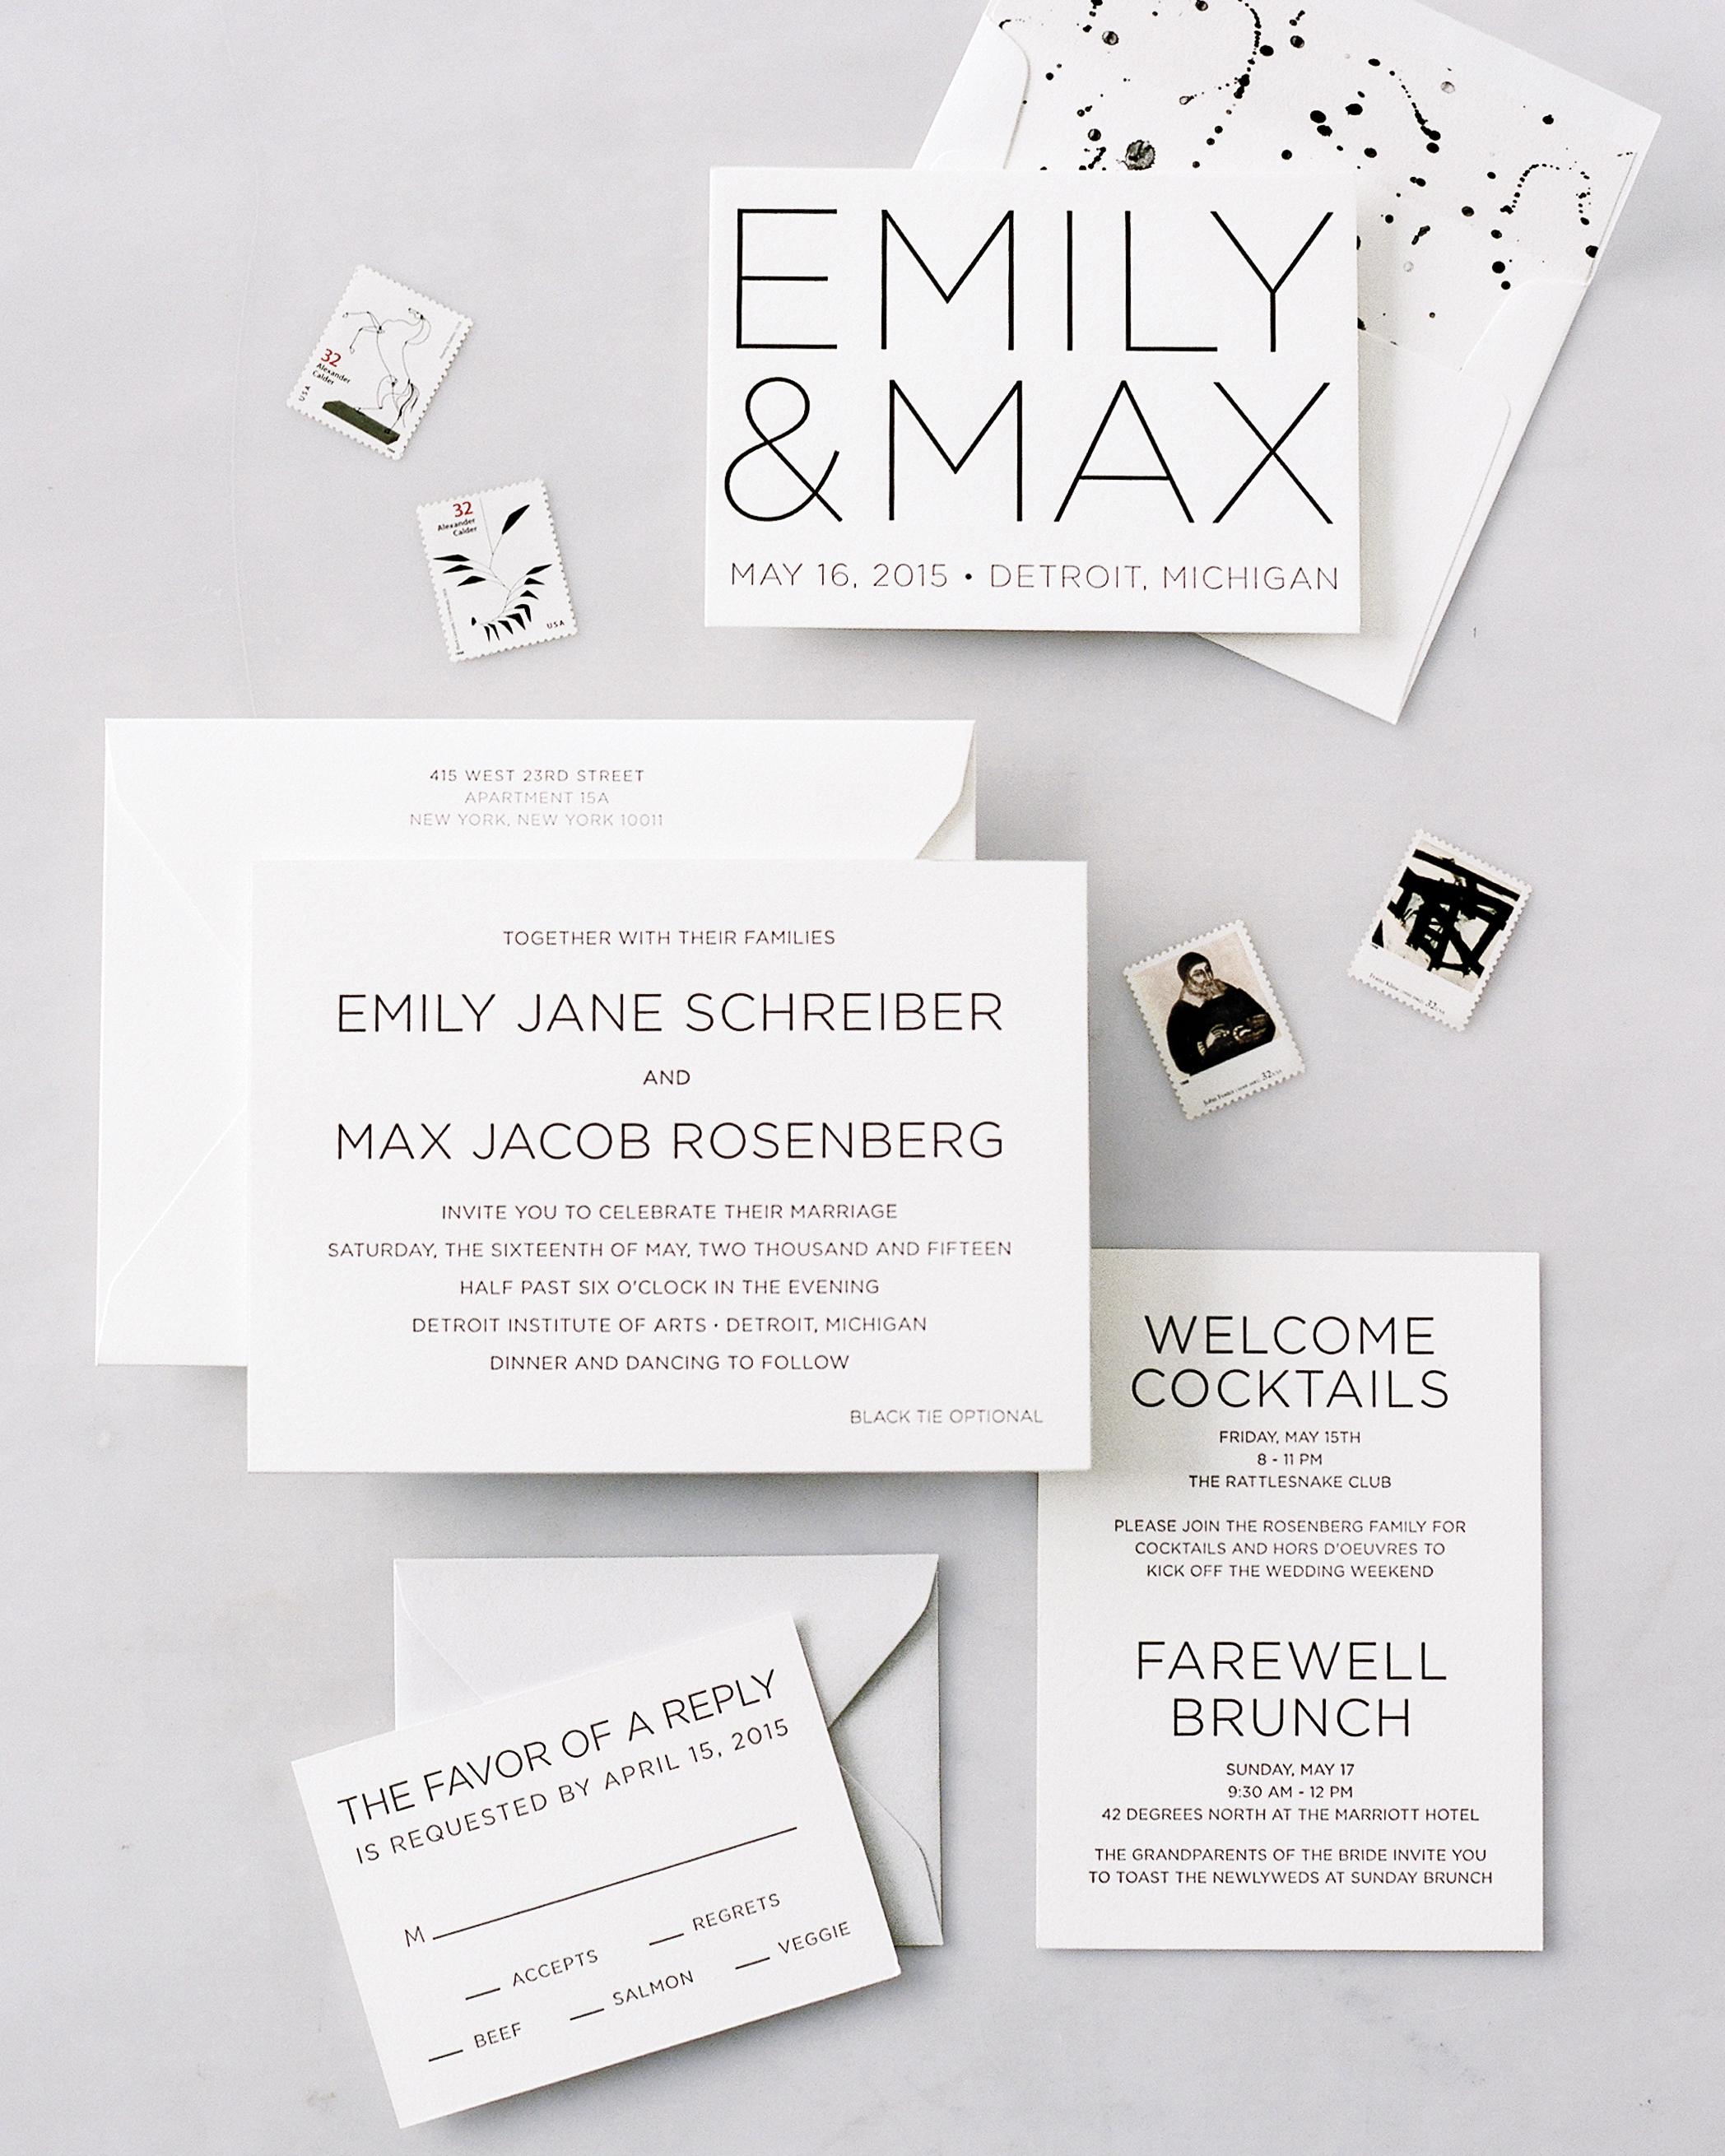 emily-max-wedding-michigan-invitation-001-s112396.jpg